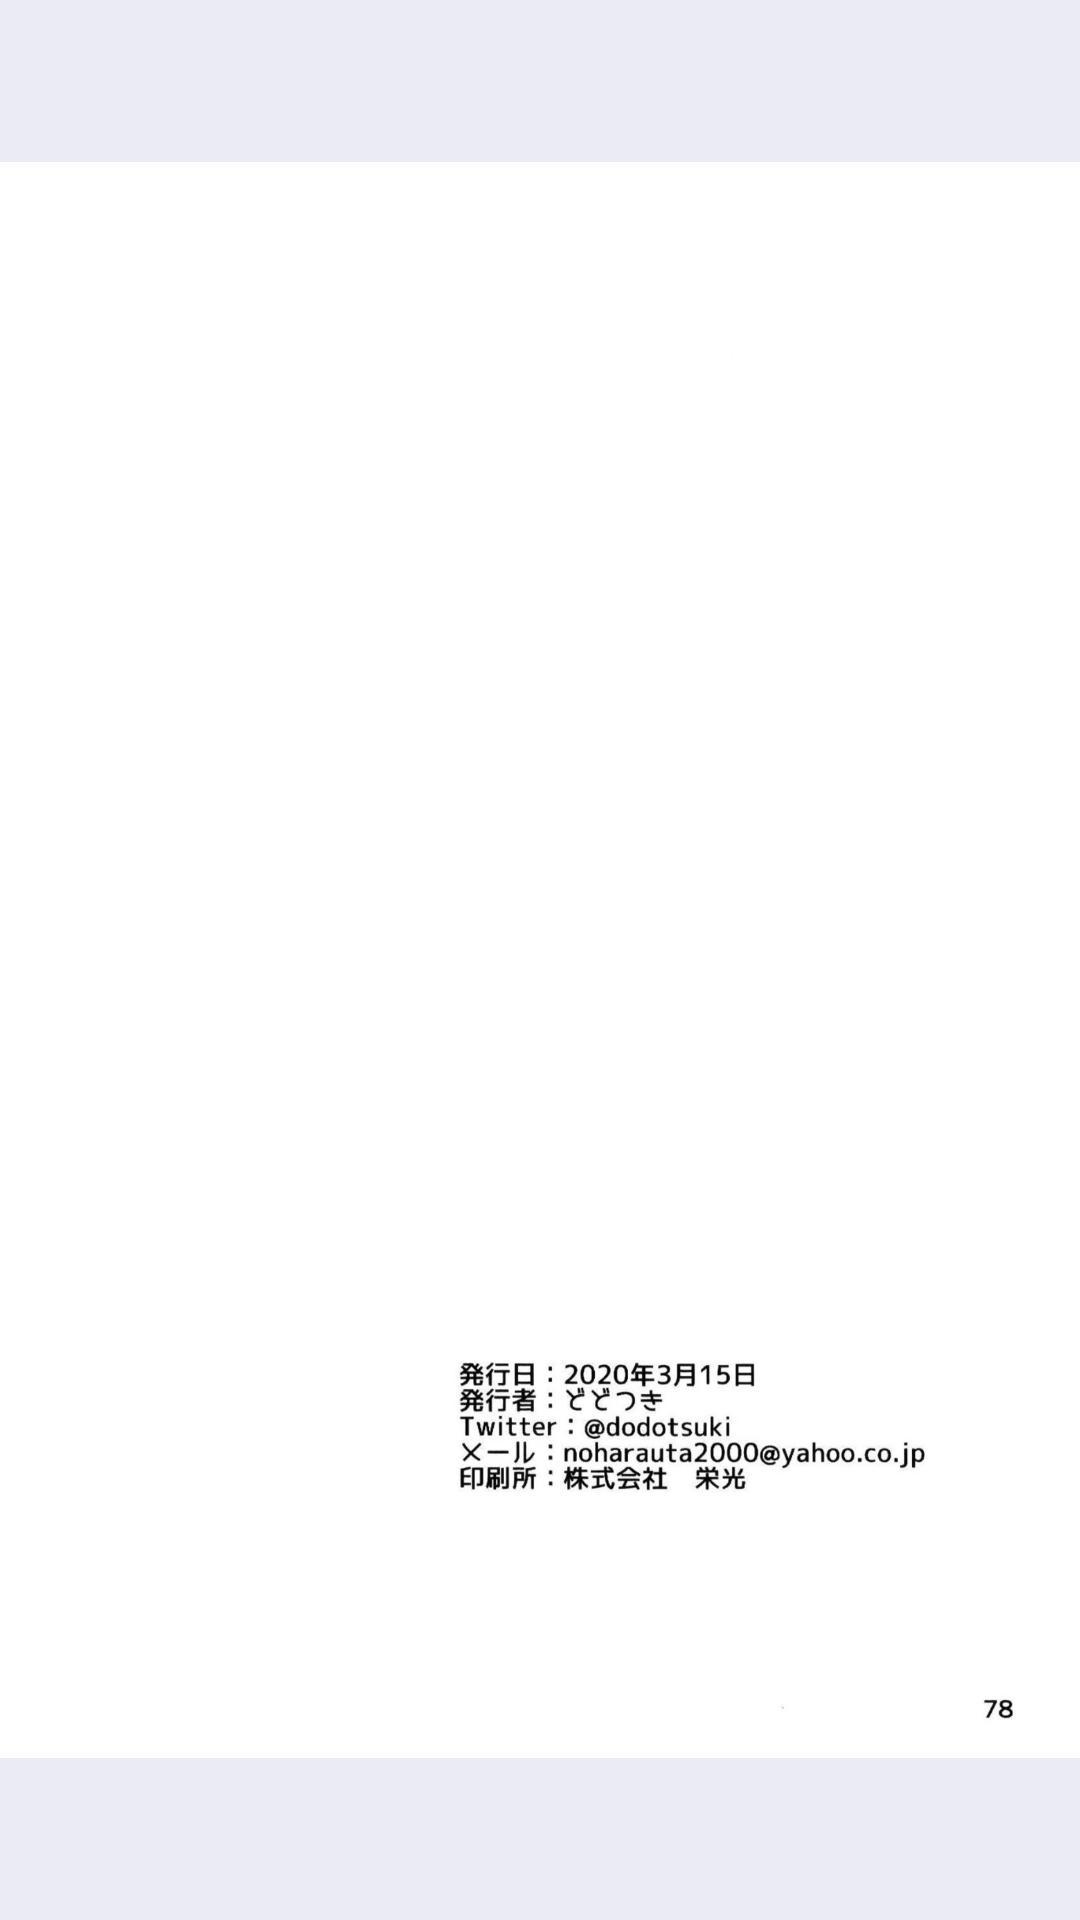 Dodotsukiya 2018-2019 Matome 77